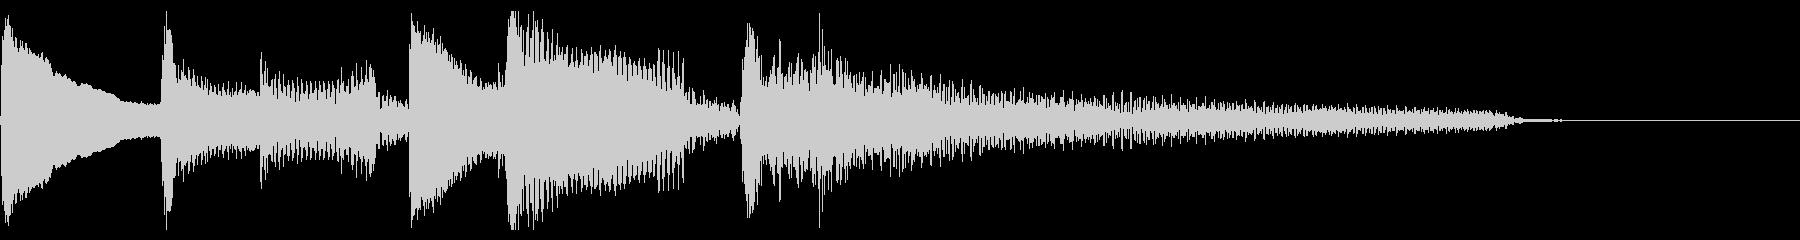 Bright arpeggio nylon guitar's unreproduced waveform